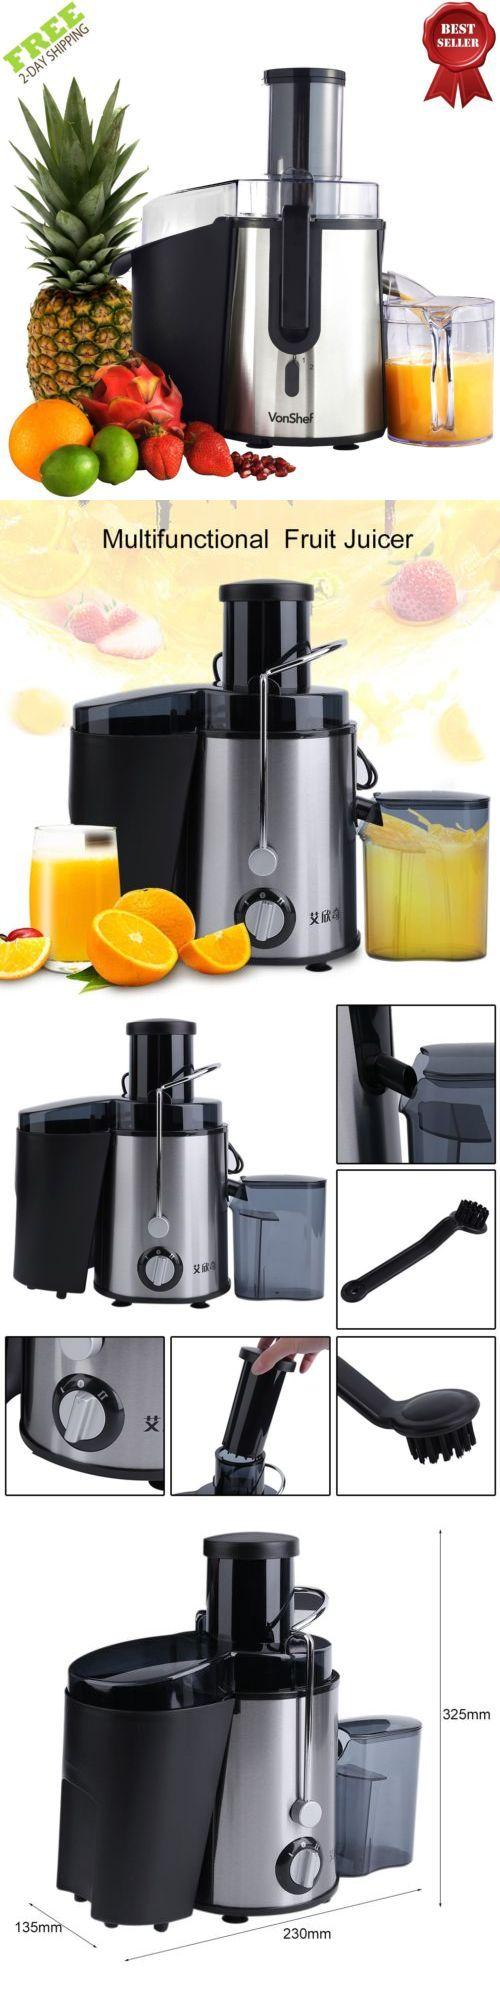 Juicers 20677: Electric Fruit Juicer Vegetable Juice Citrus Extractor Machine Maker Blender New -> BUY IT NOW ONLY: $33.84 on eBay!